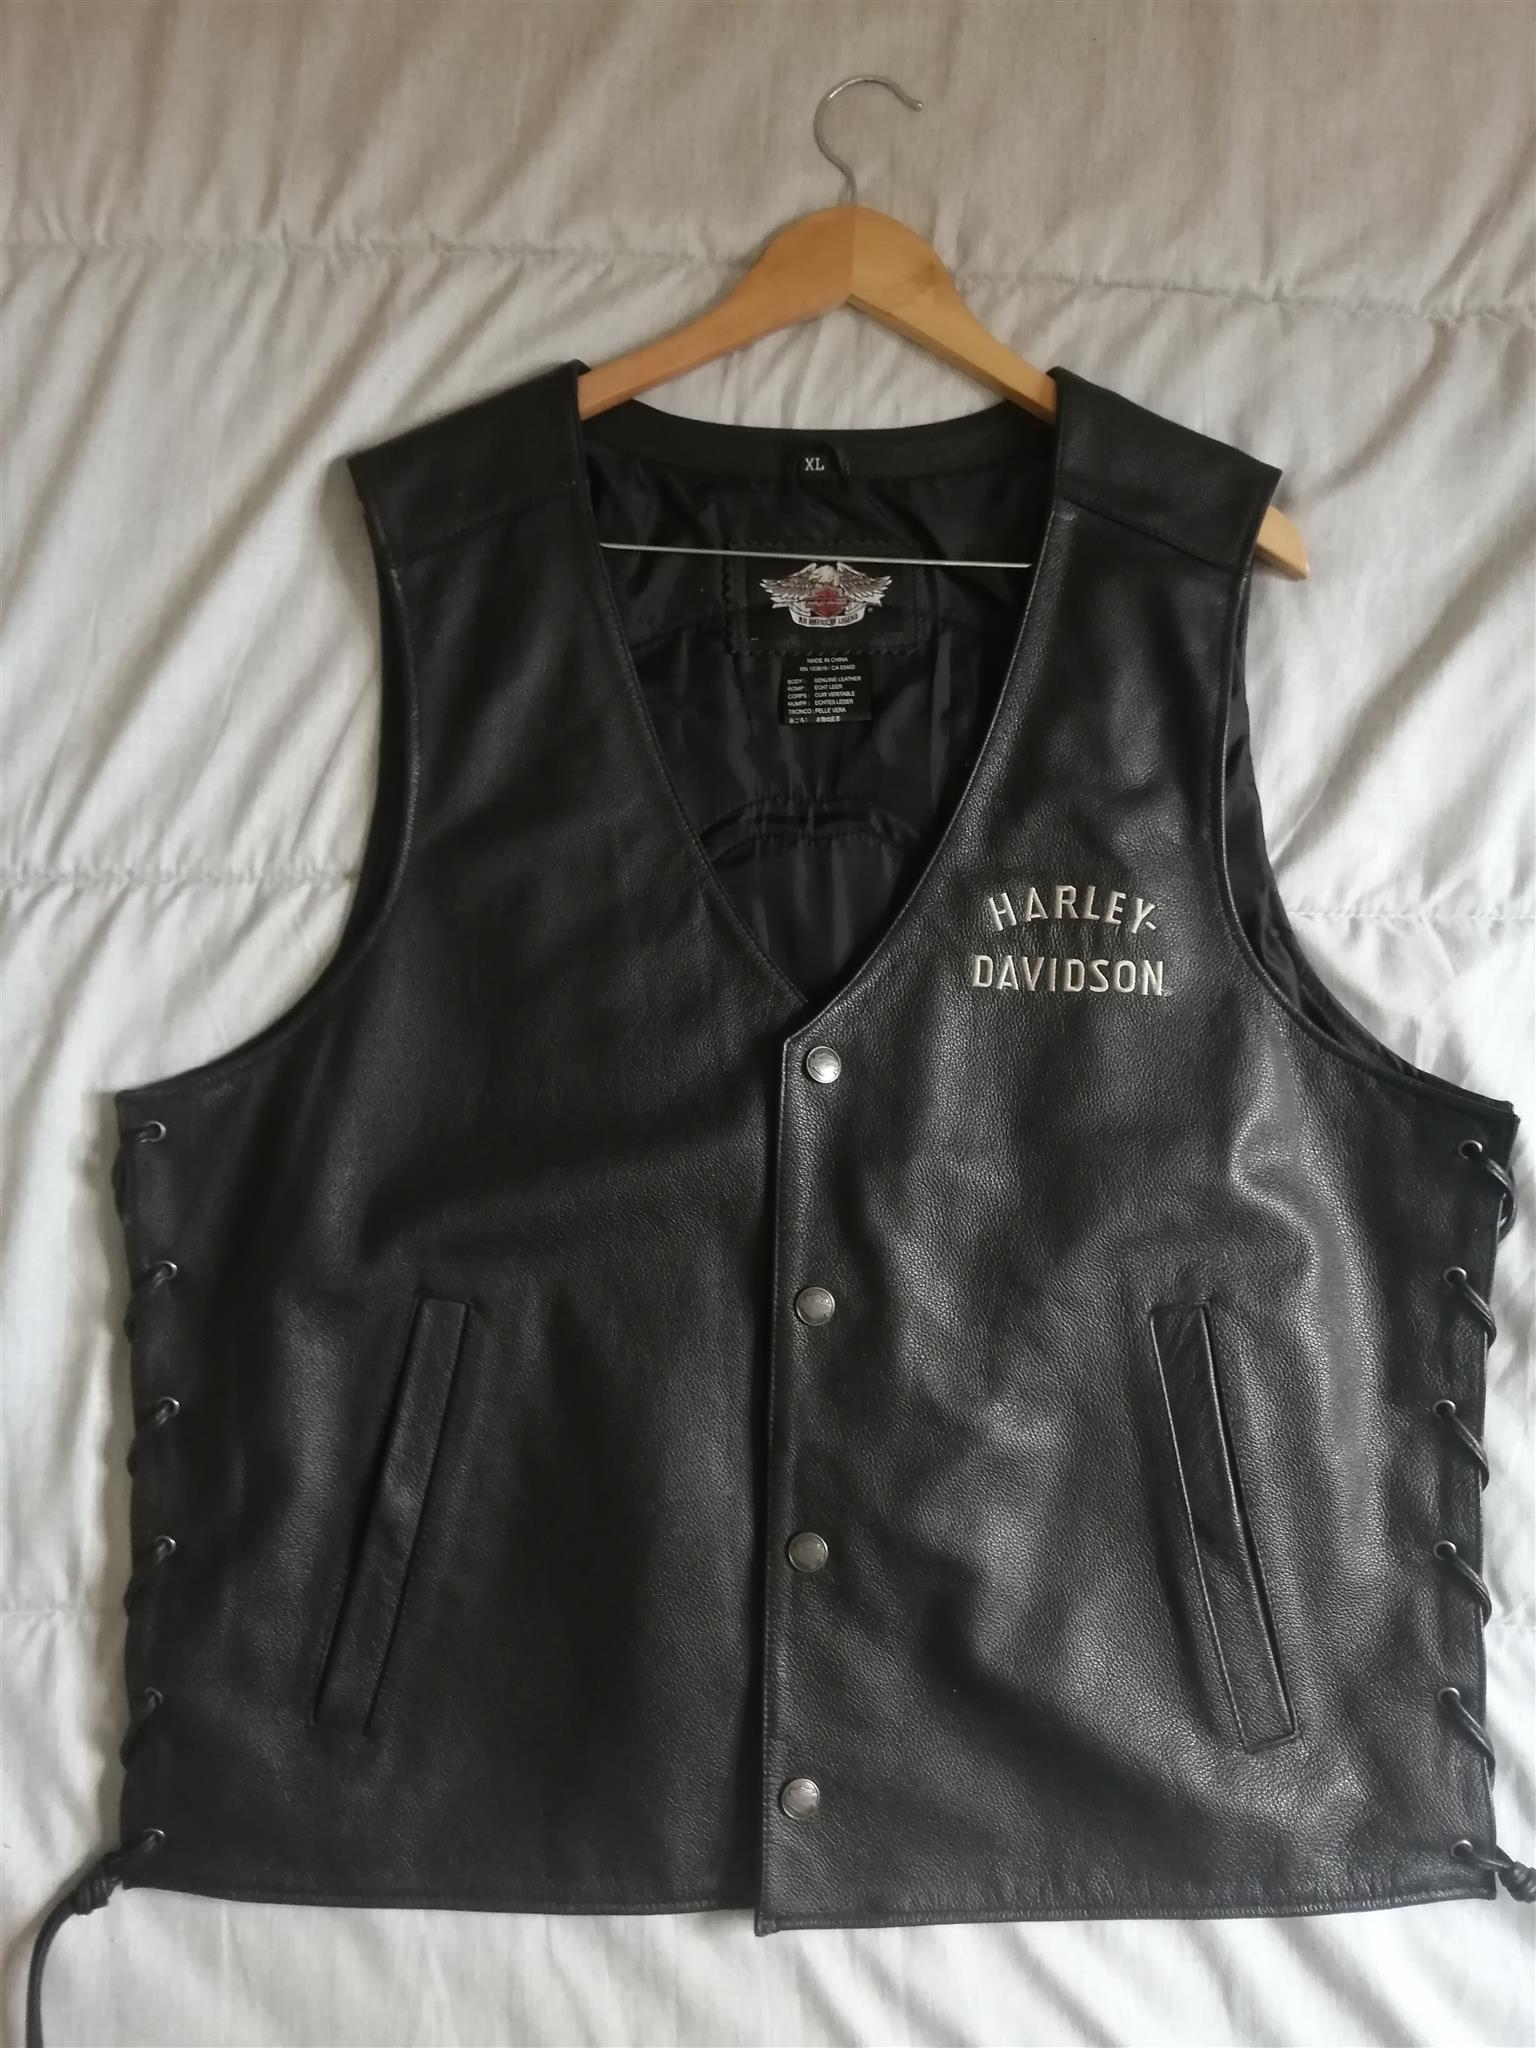 Leather jacket - Harley Davidson